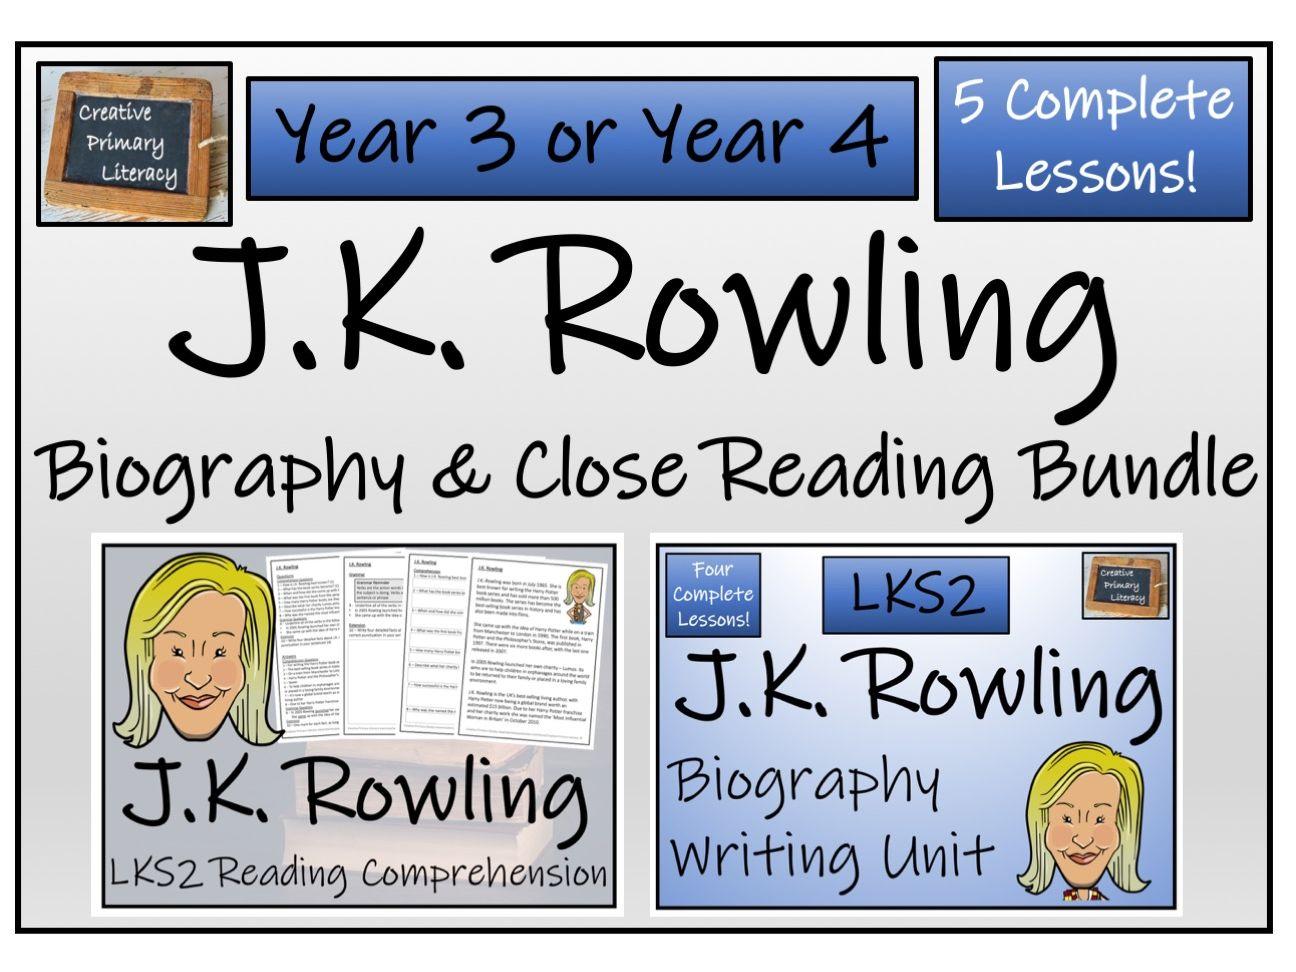 LKS2 Literacy - J.K. Rowling Reading Comprehension & Biography Bundle